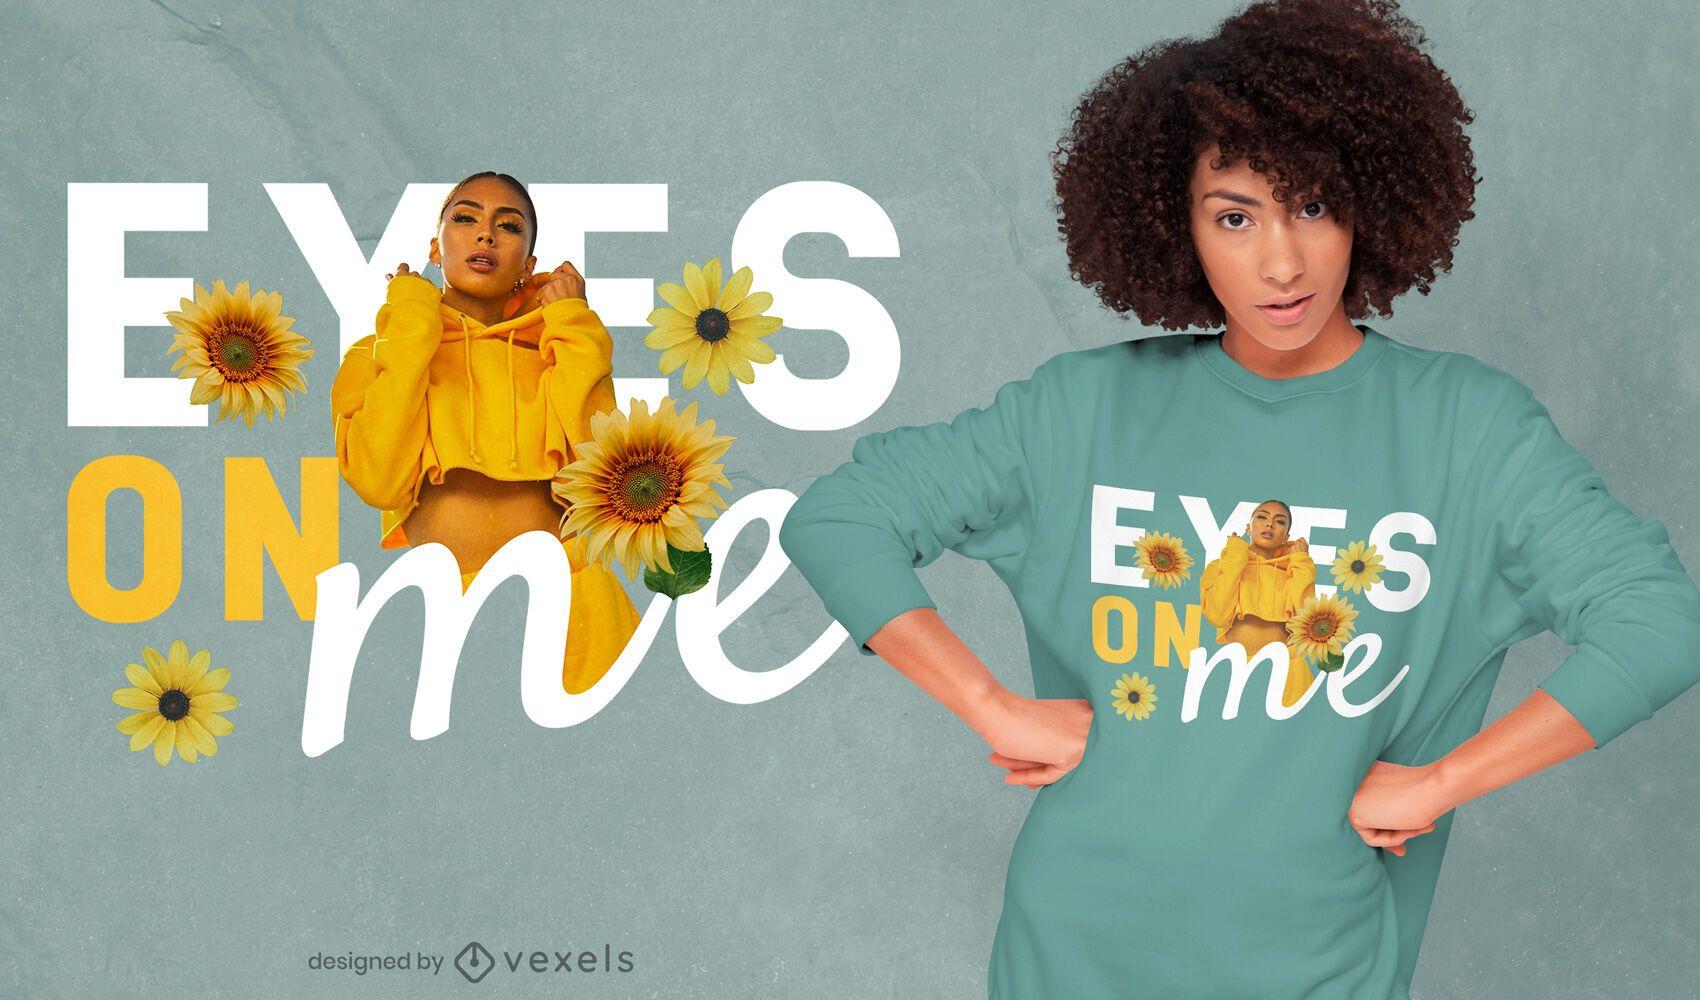 Olhos em mim design floral girl psd t-shirt